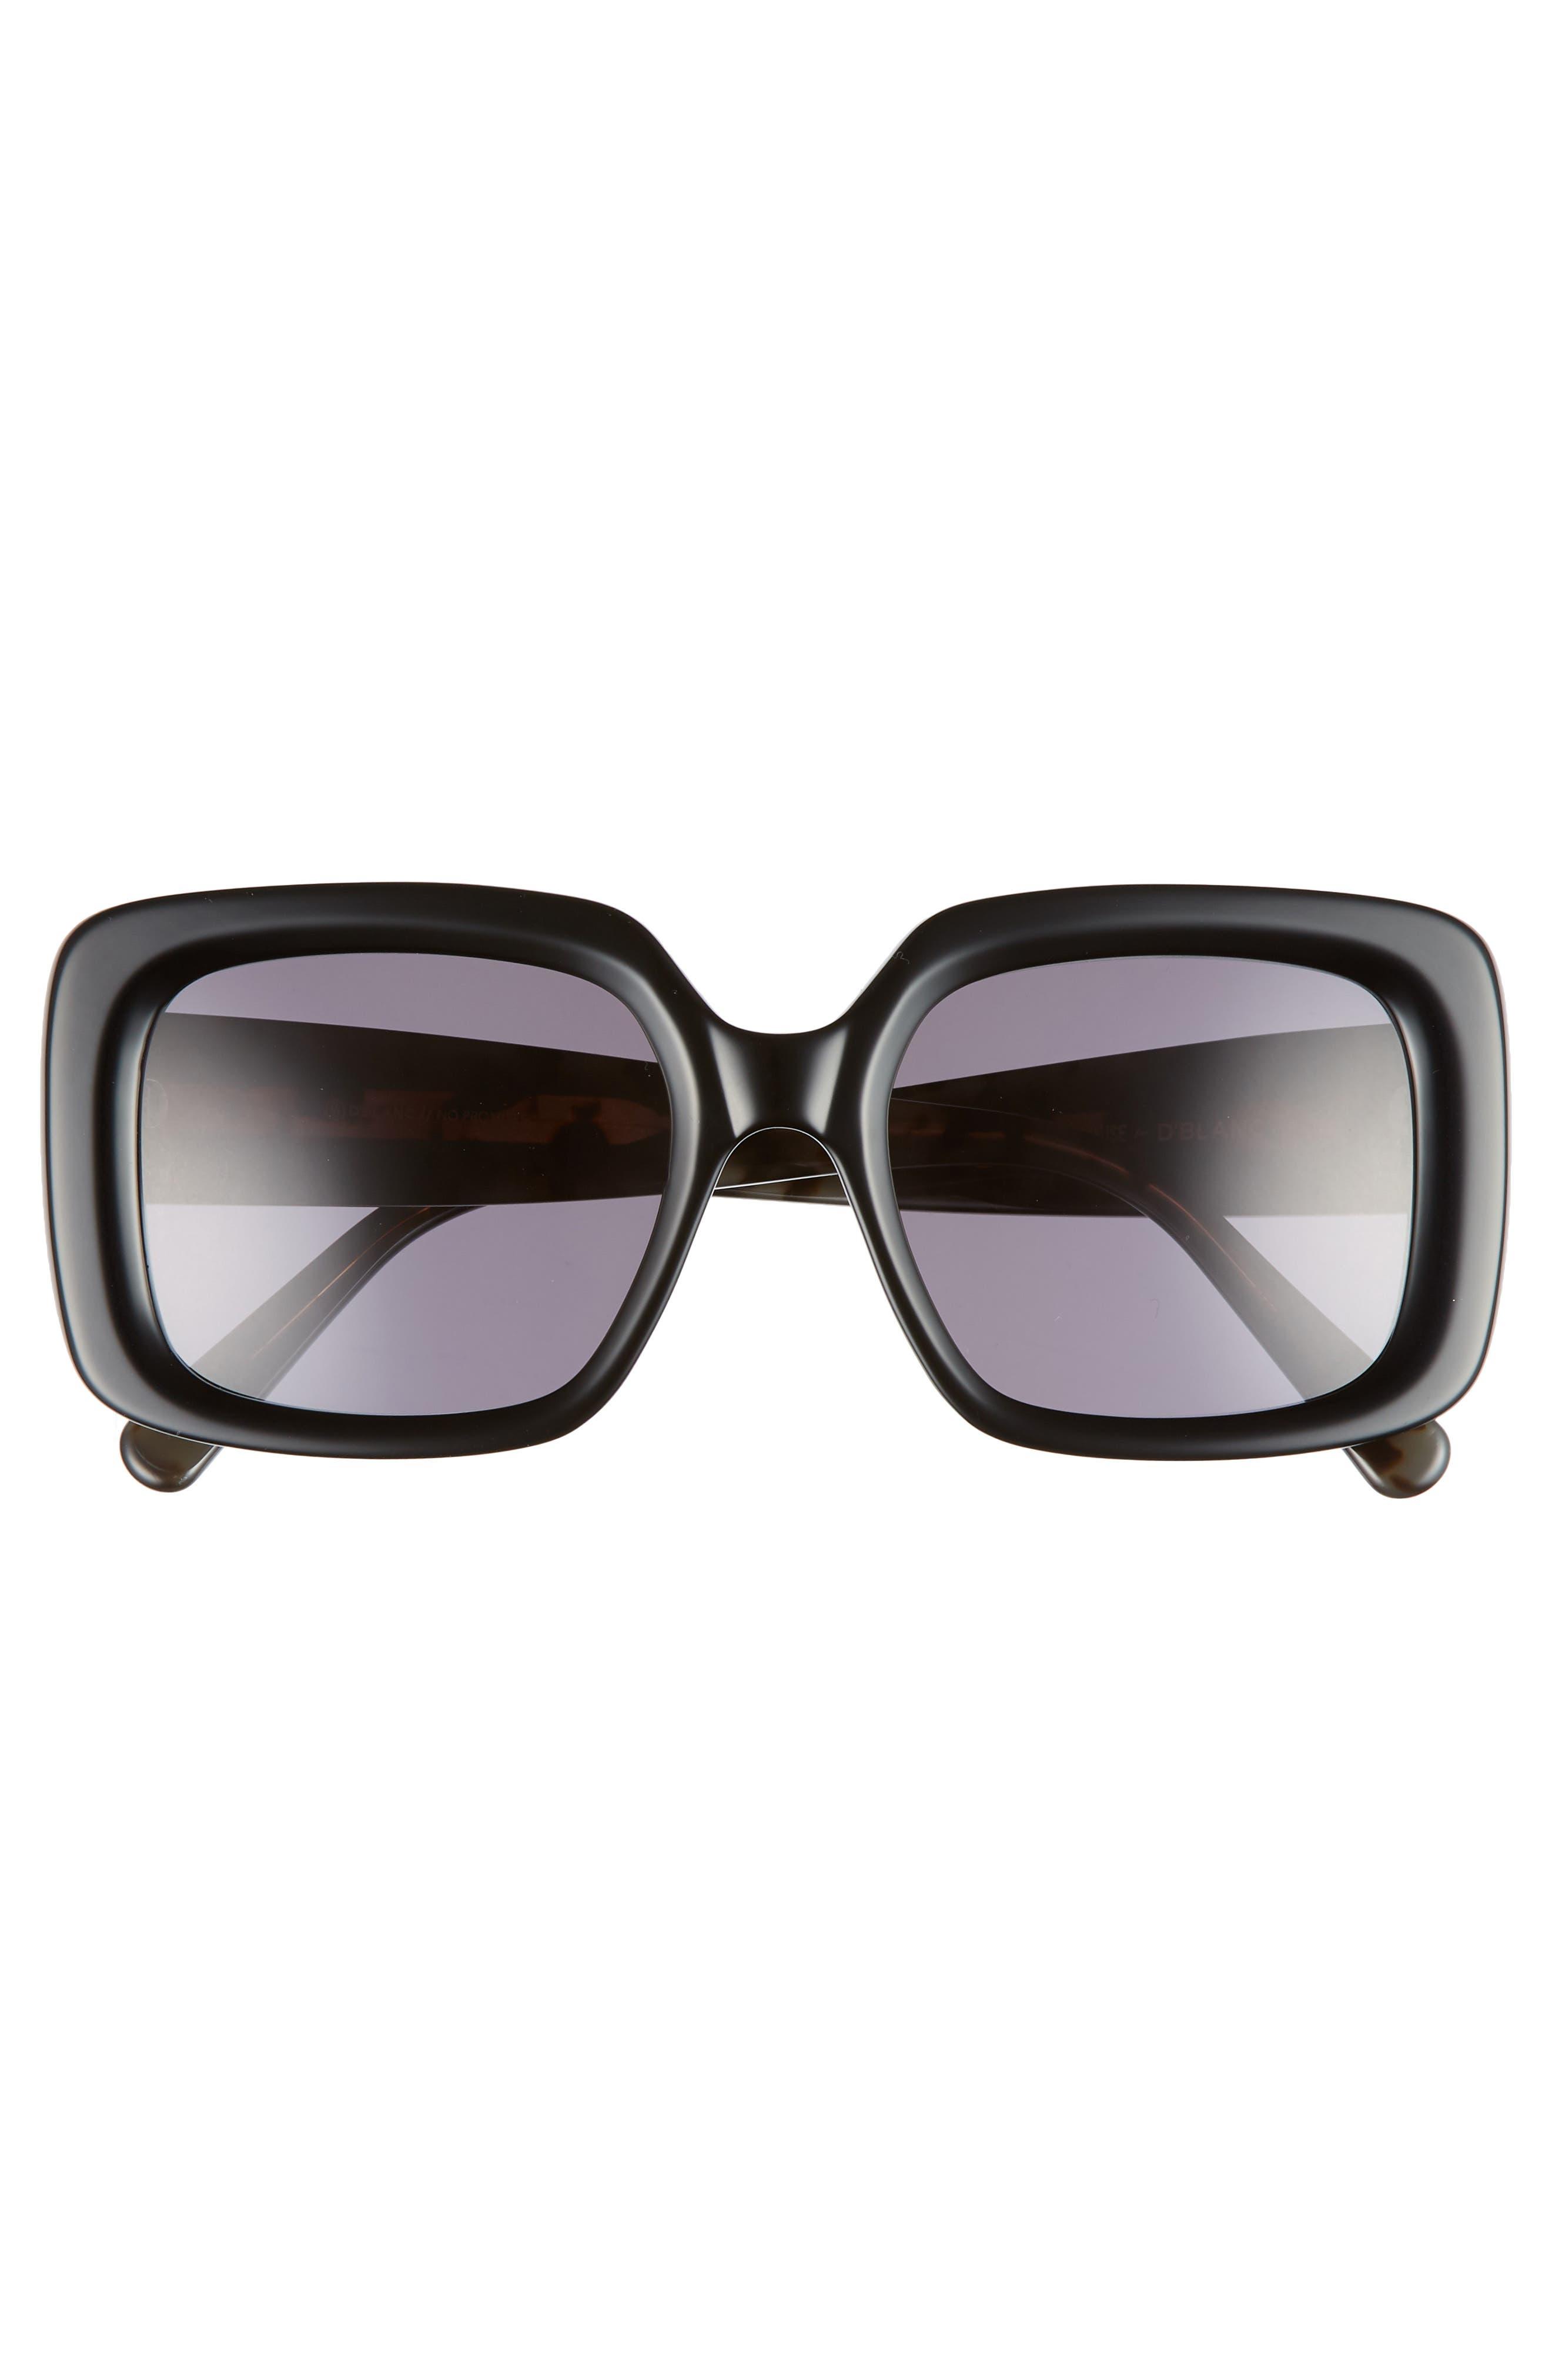 D'BLANC No Promises 53mm Sunglasses,                             Alternate thumbnail 3, color,                             001